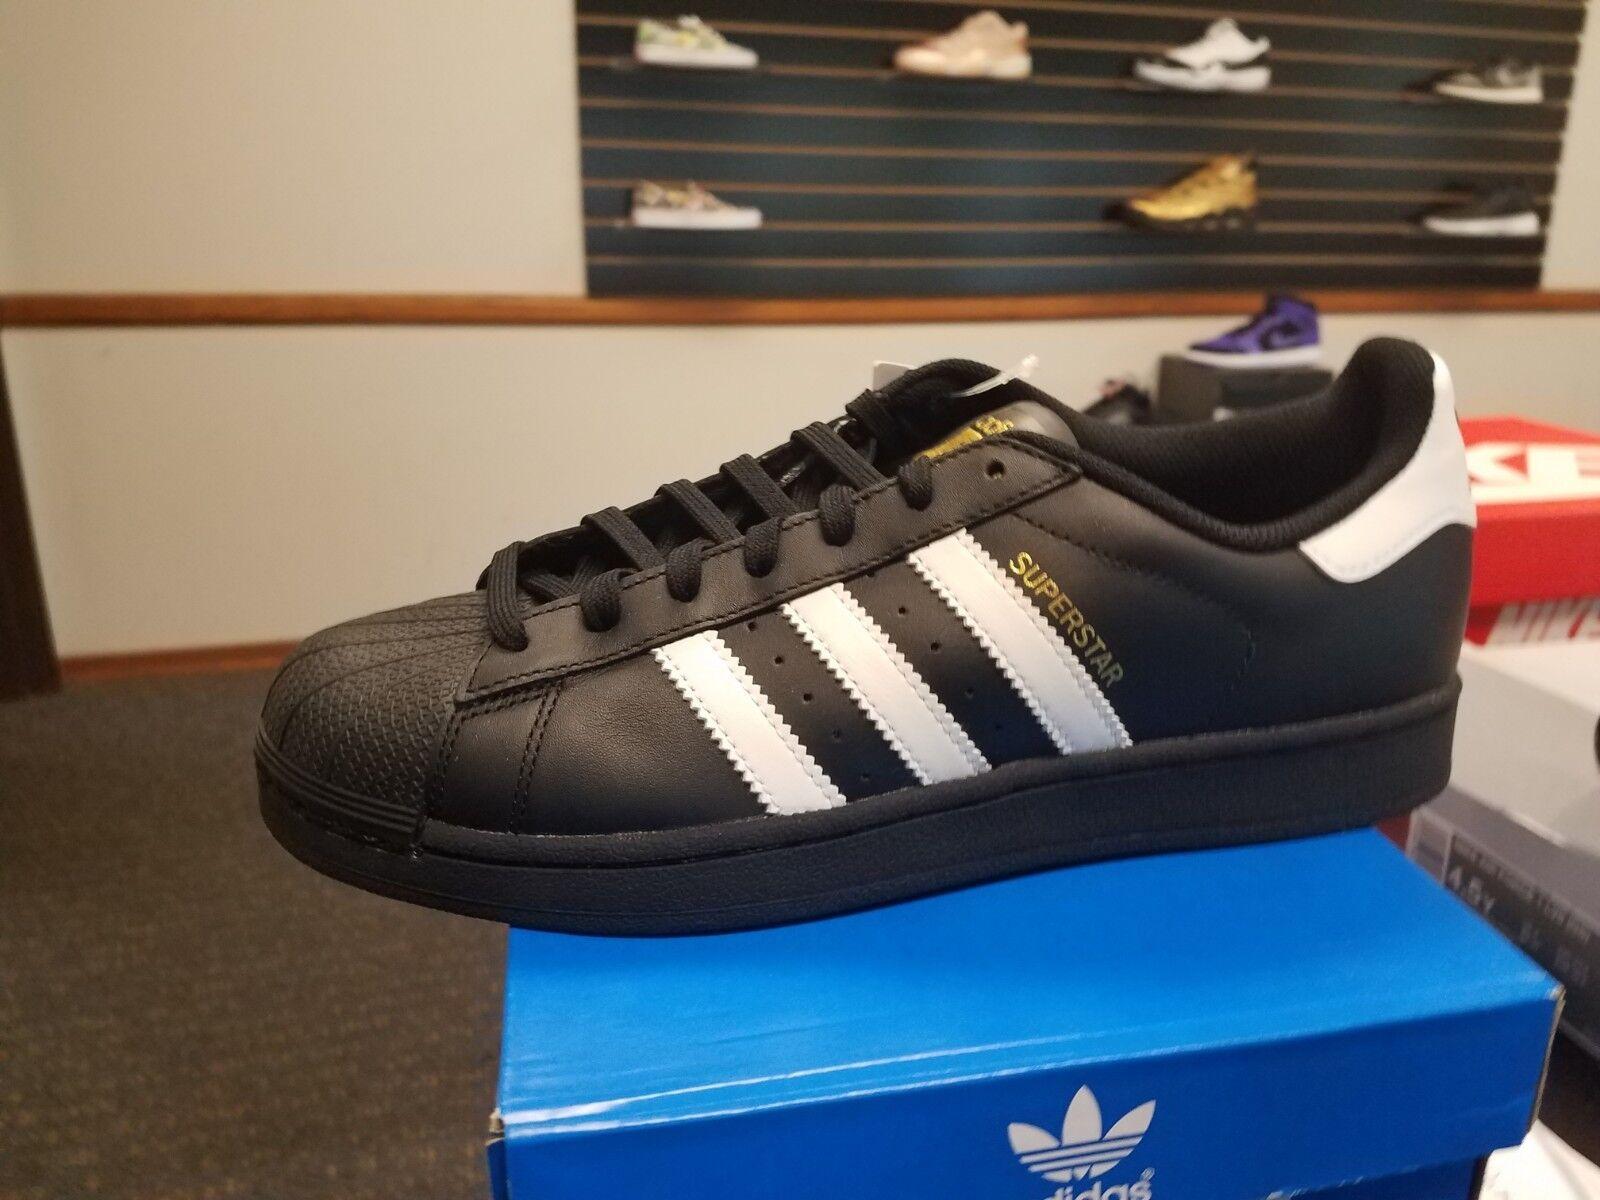 Brand New in Box Adidas Men's Super Star Basketball B27140 BLACK WHITE gold